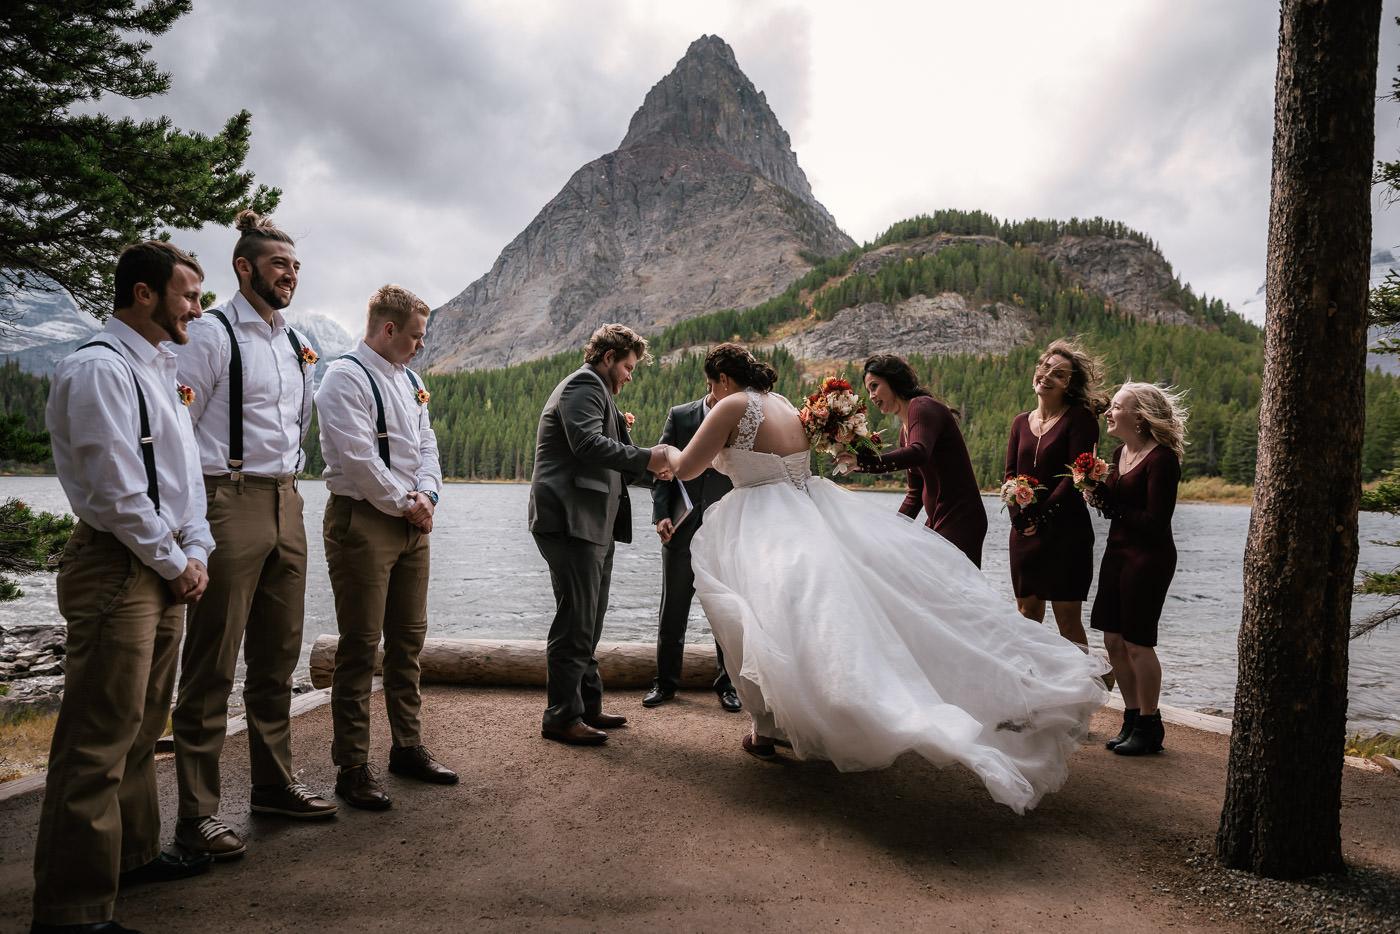 Lakeside elopement ceremony in Glacier National Park.